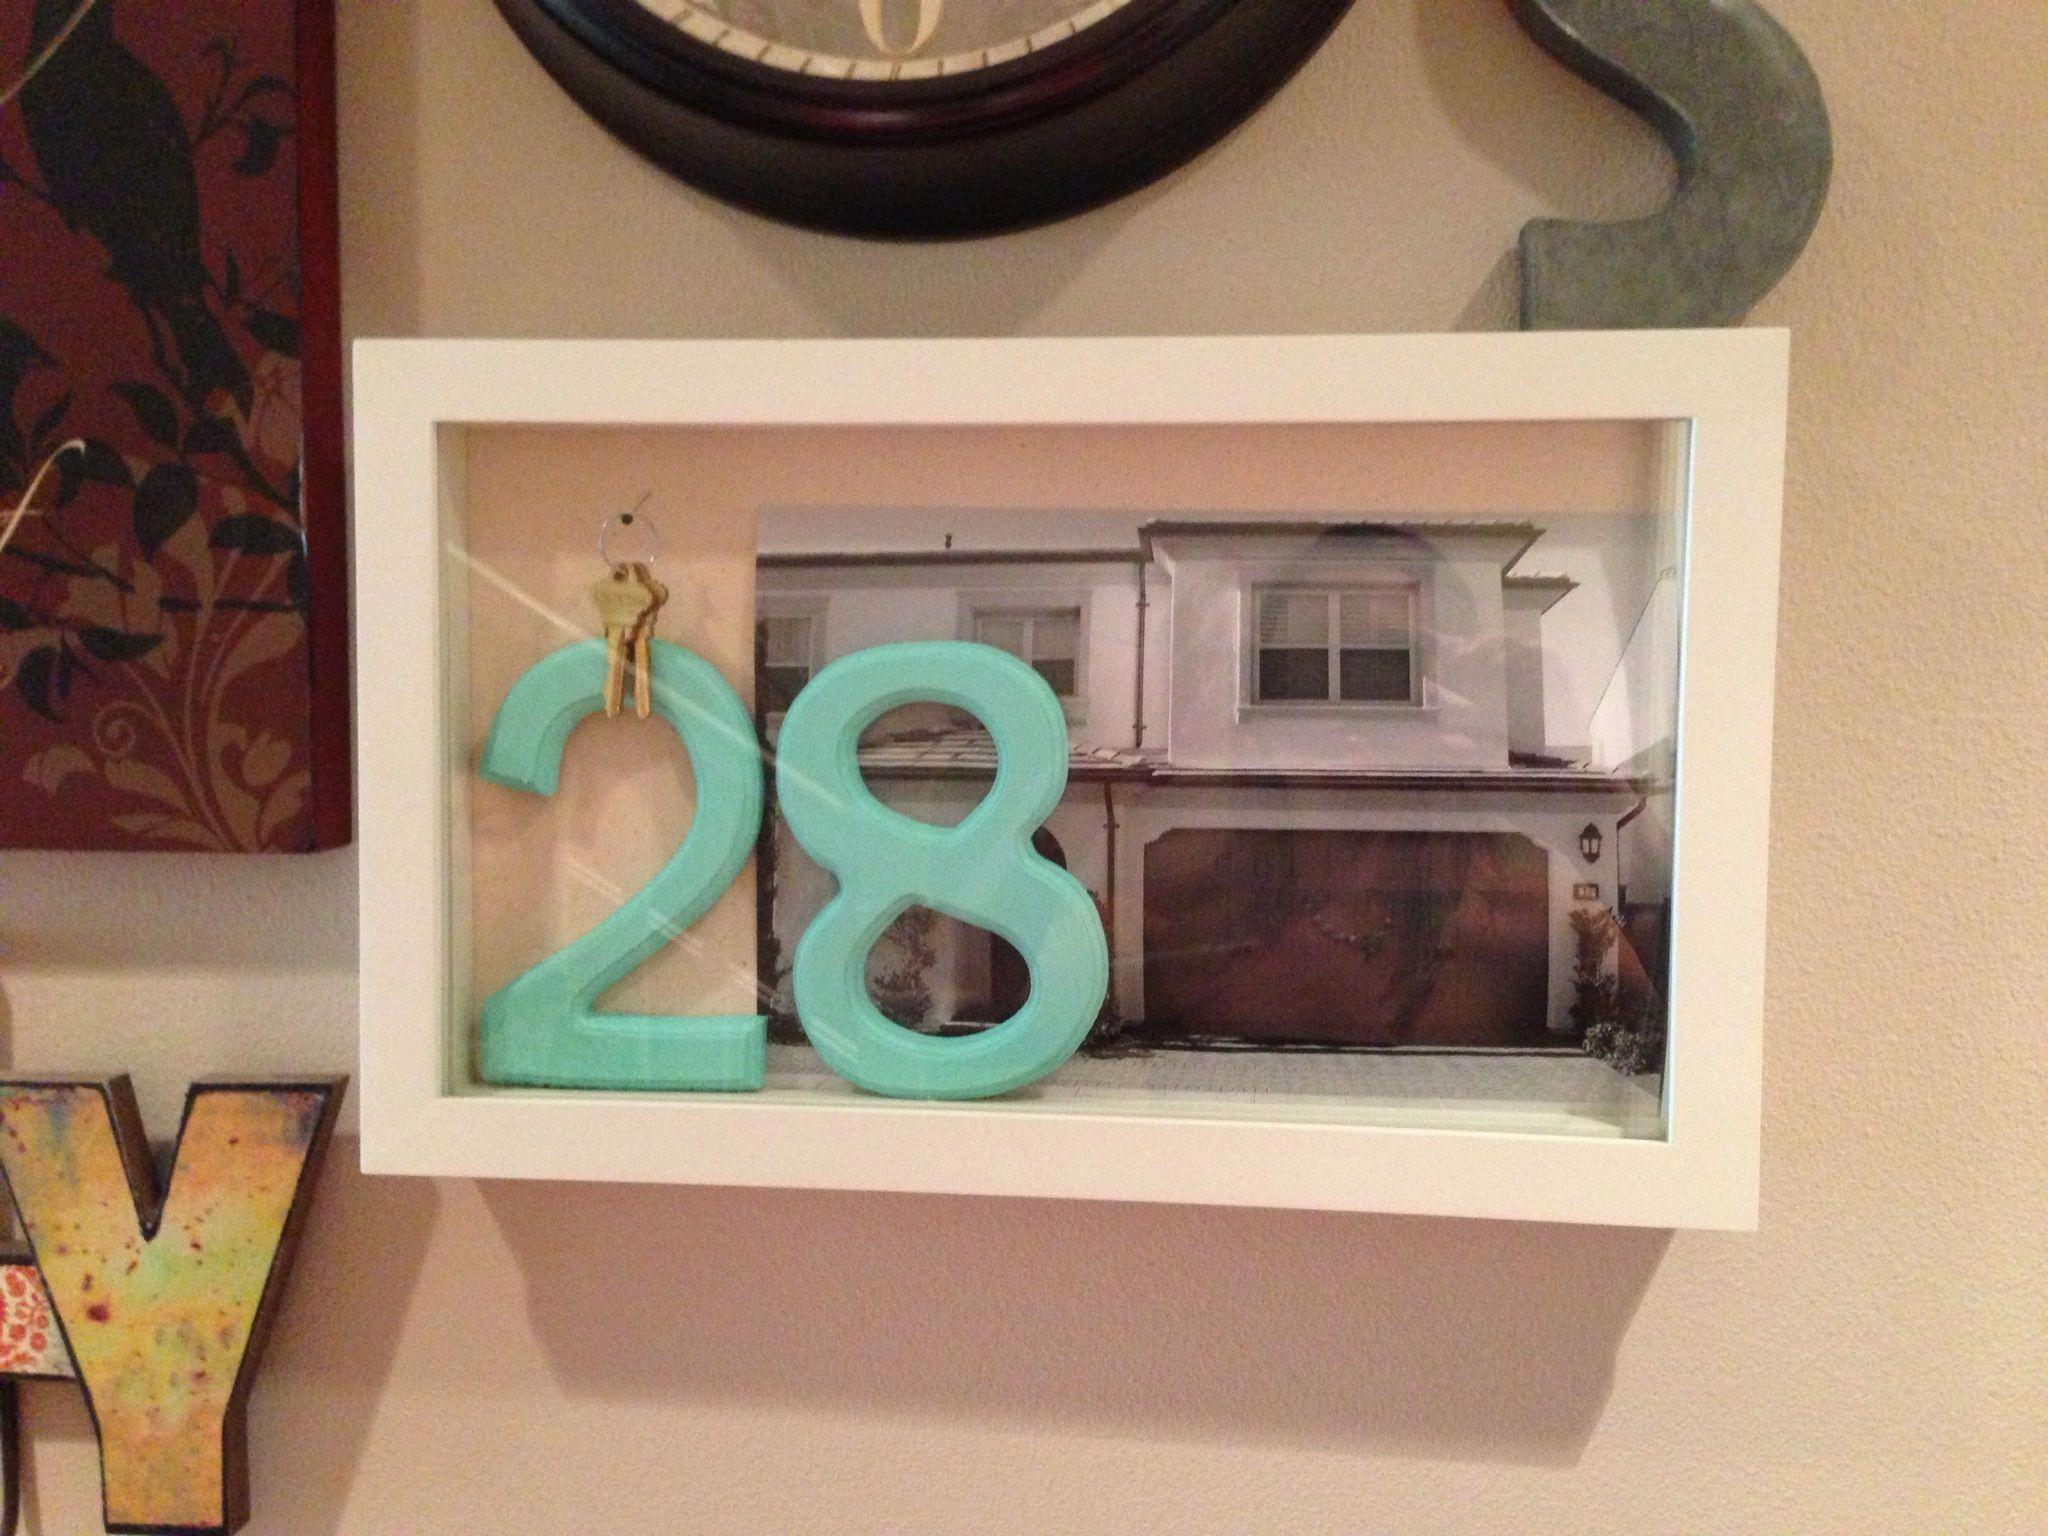 Real Estate closing gift. Sara Hereford, Fox Properties